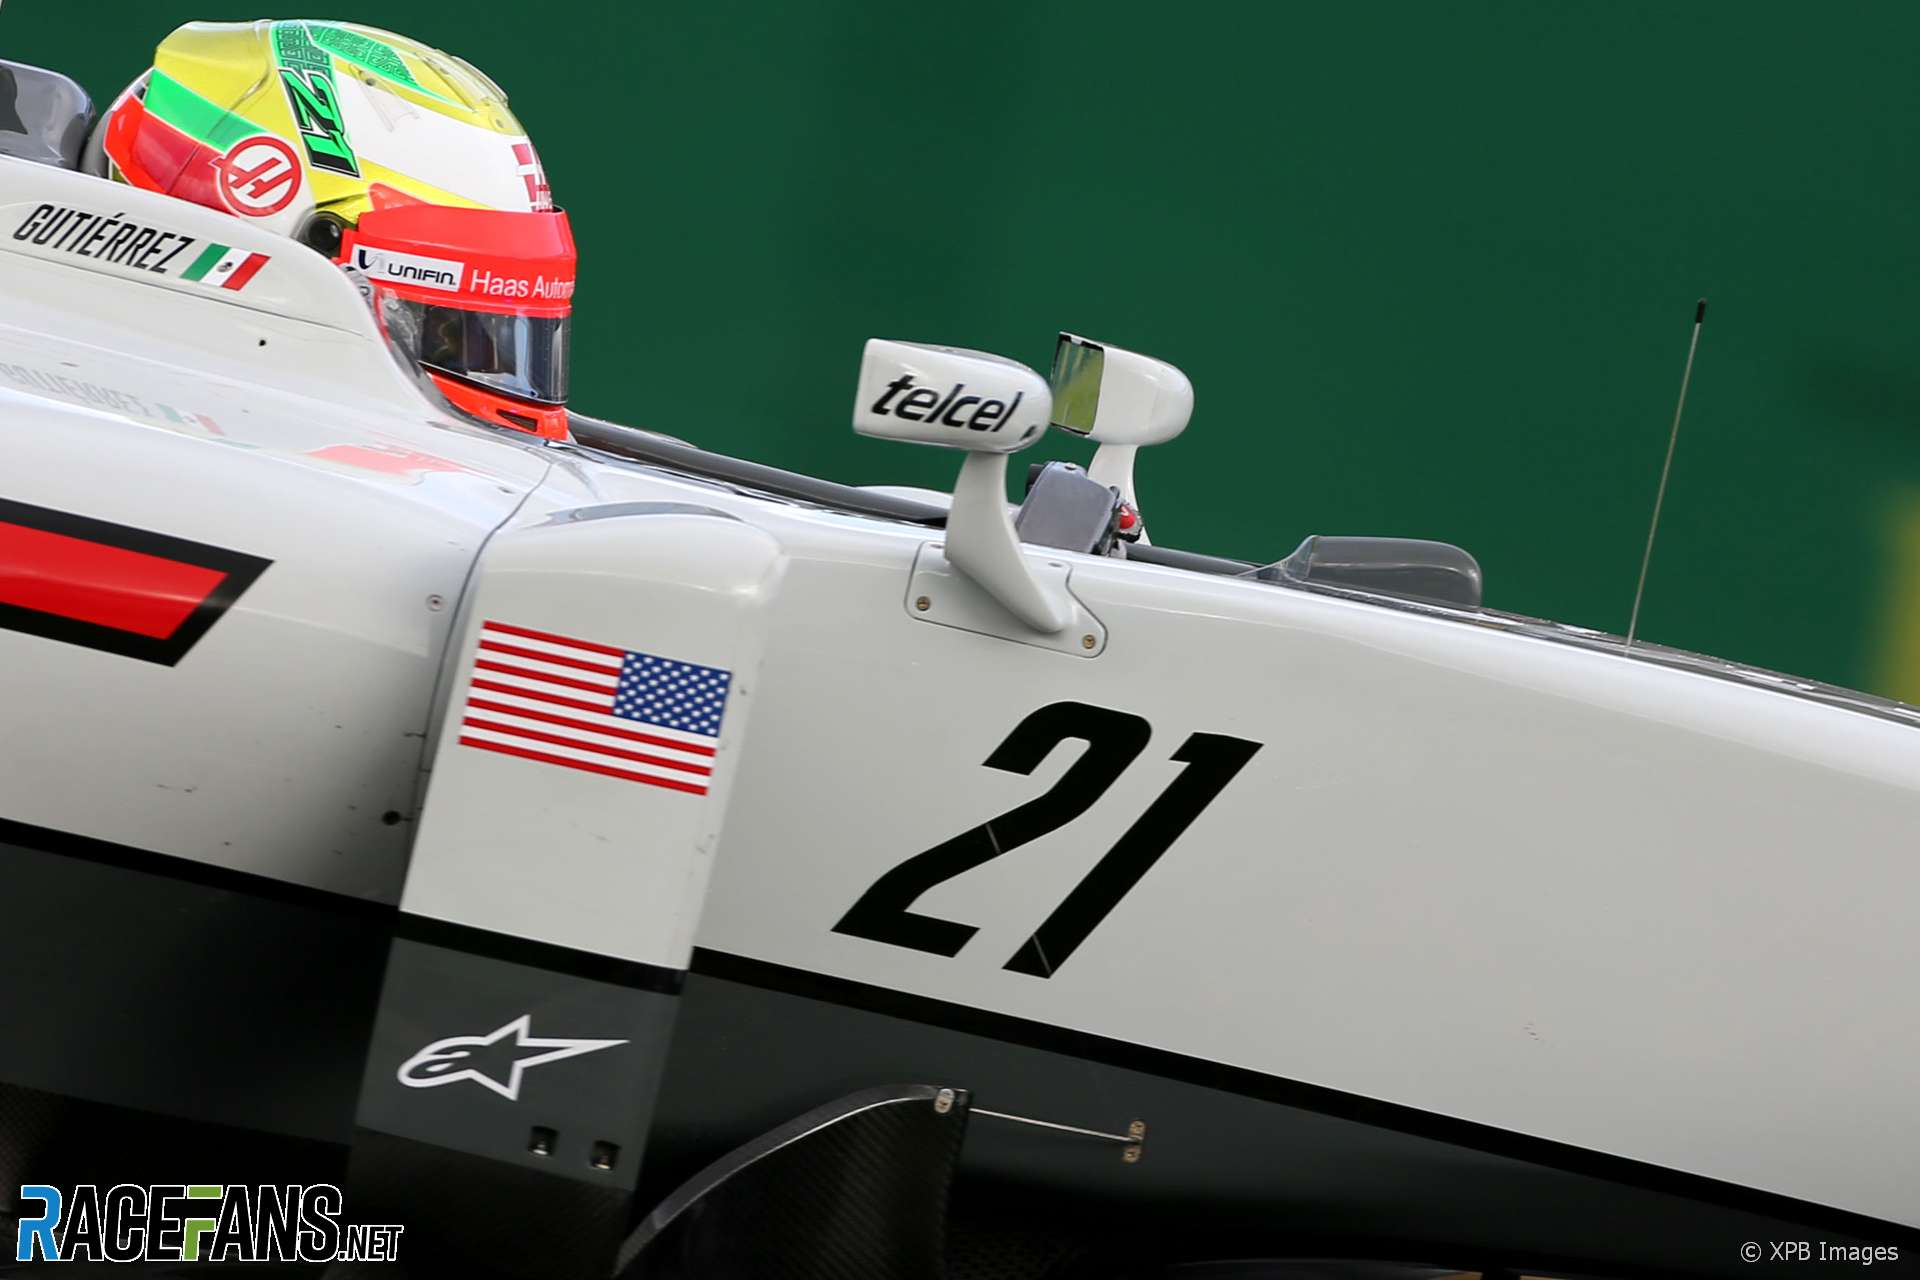 Esteban Gutierrez, Haas, Melbourne, 2016